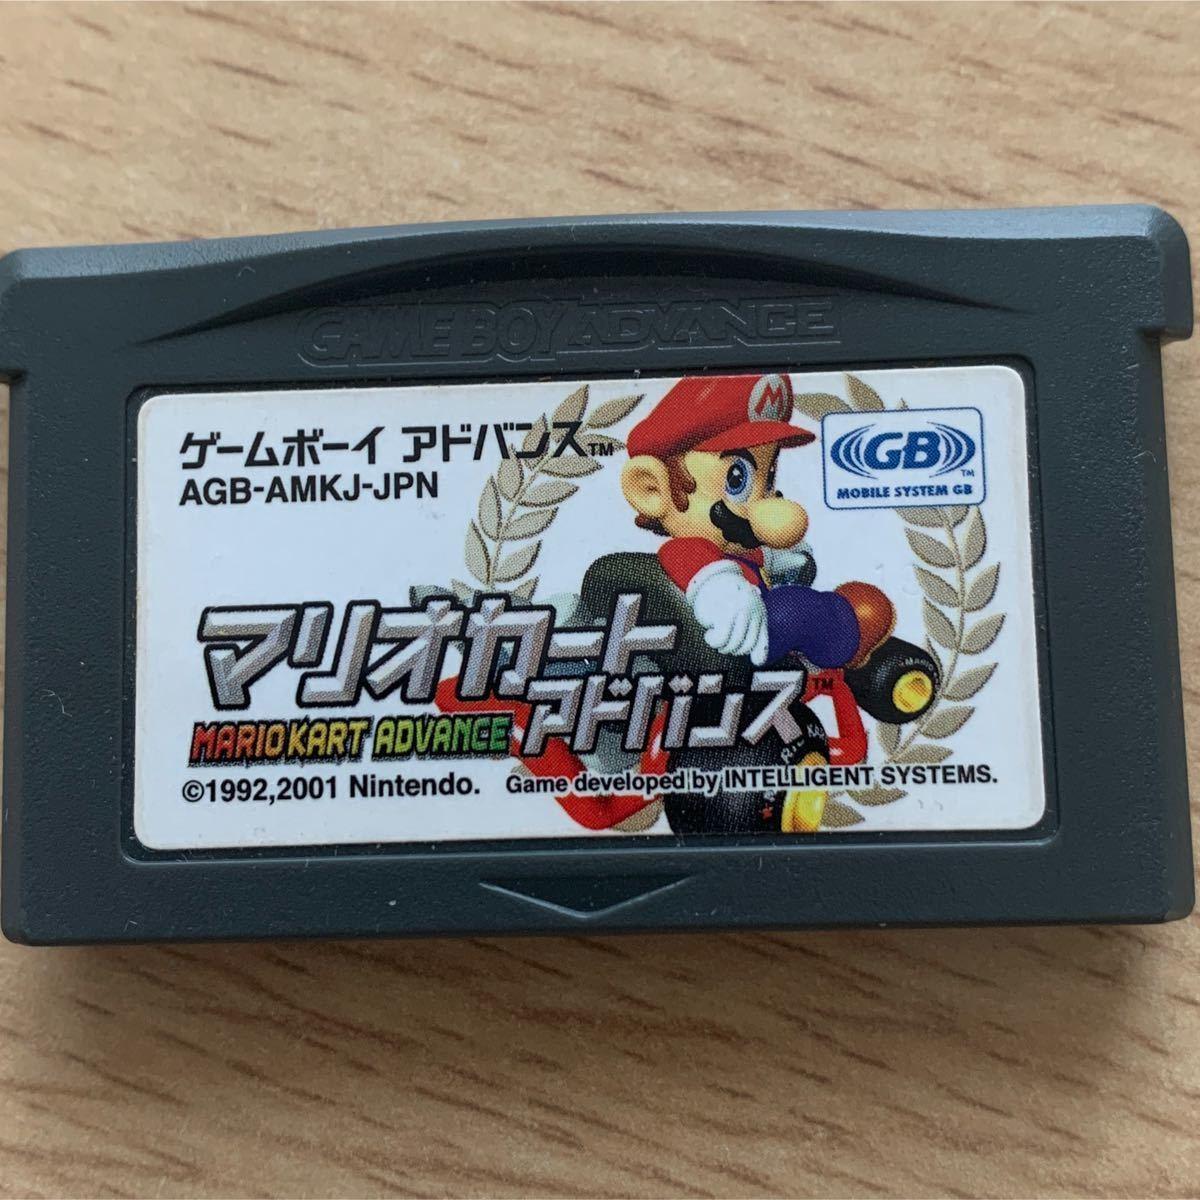 GBA マリオカートアドバンス ゲームボーイアドバンス ソフト ゲームボーイアドバンスソフト